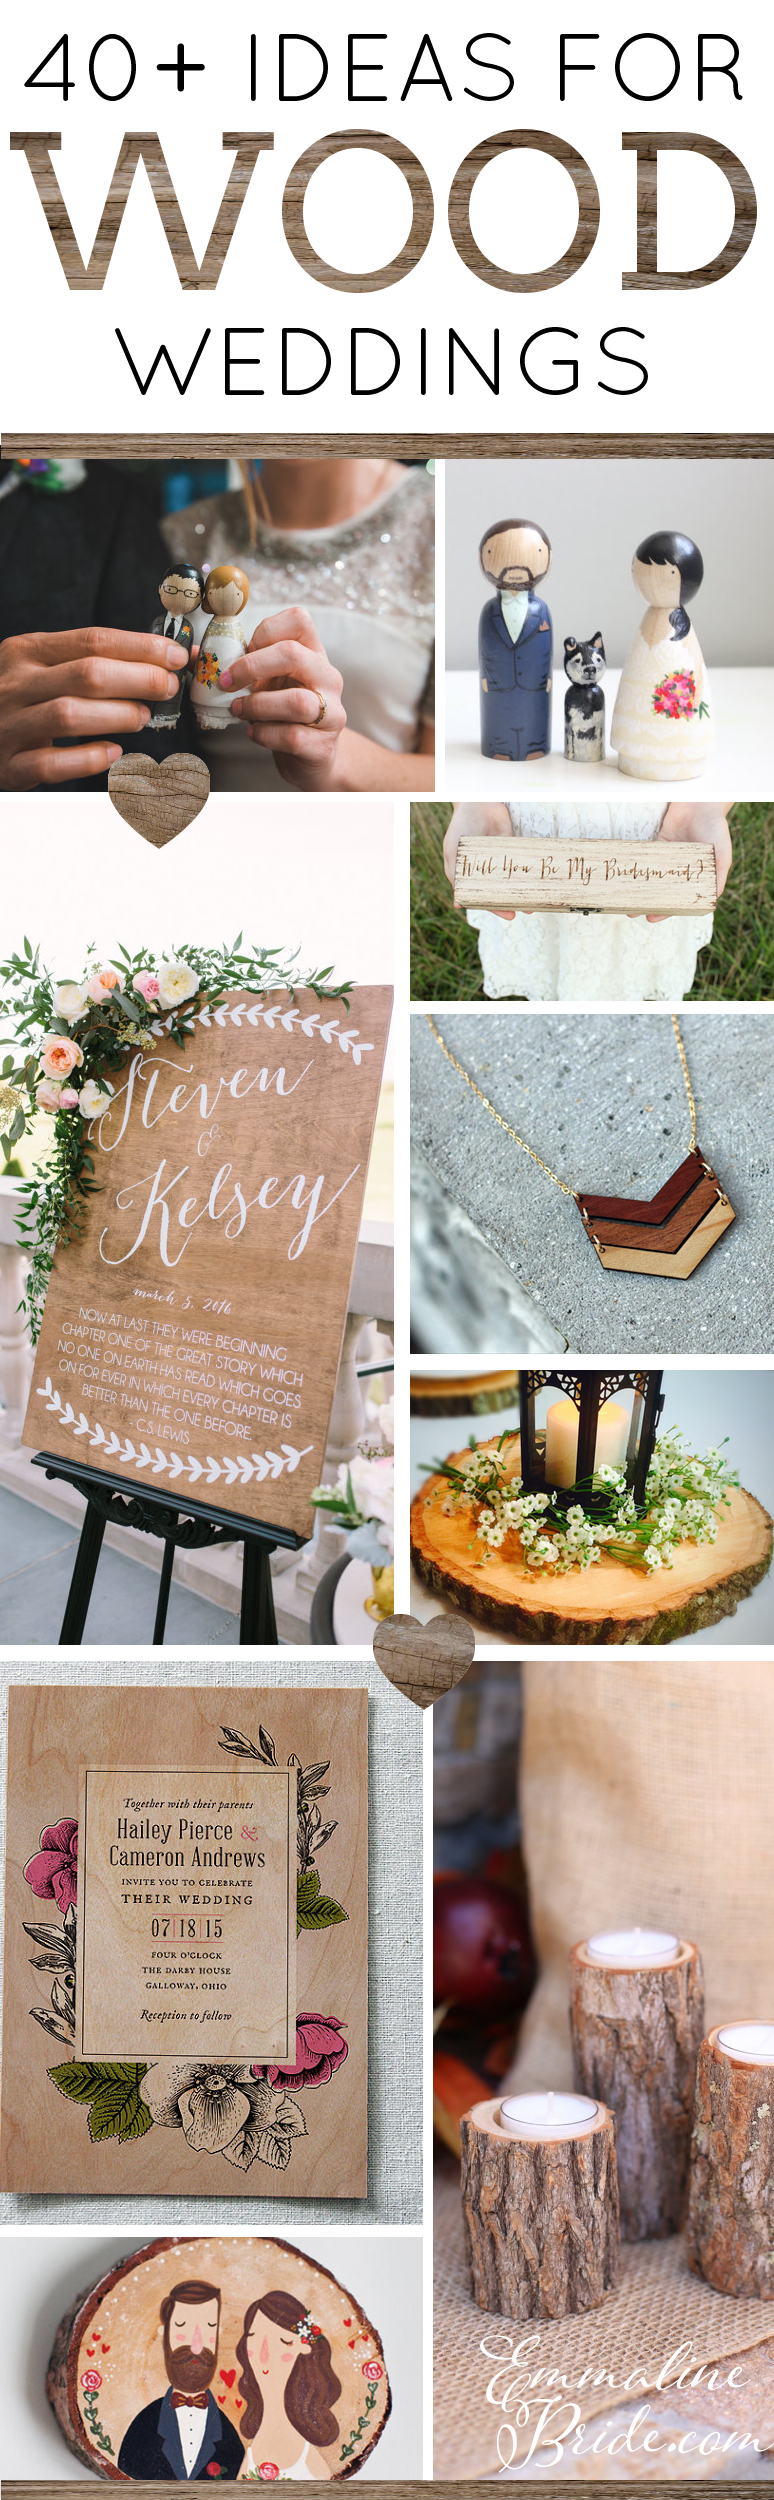 creative wood themed wedding ideas diy wedding pinterest